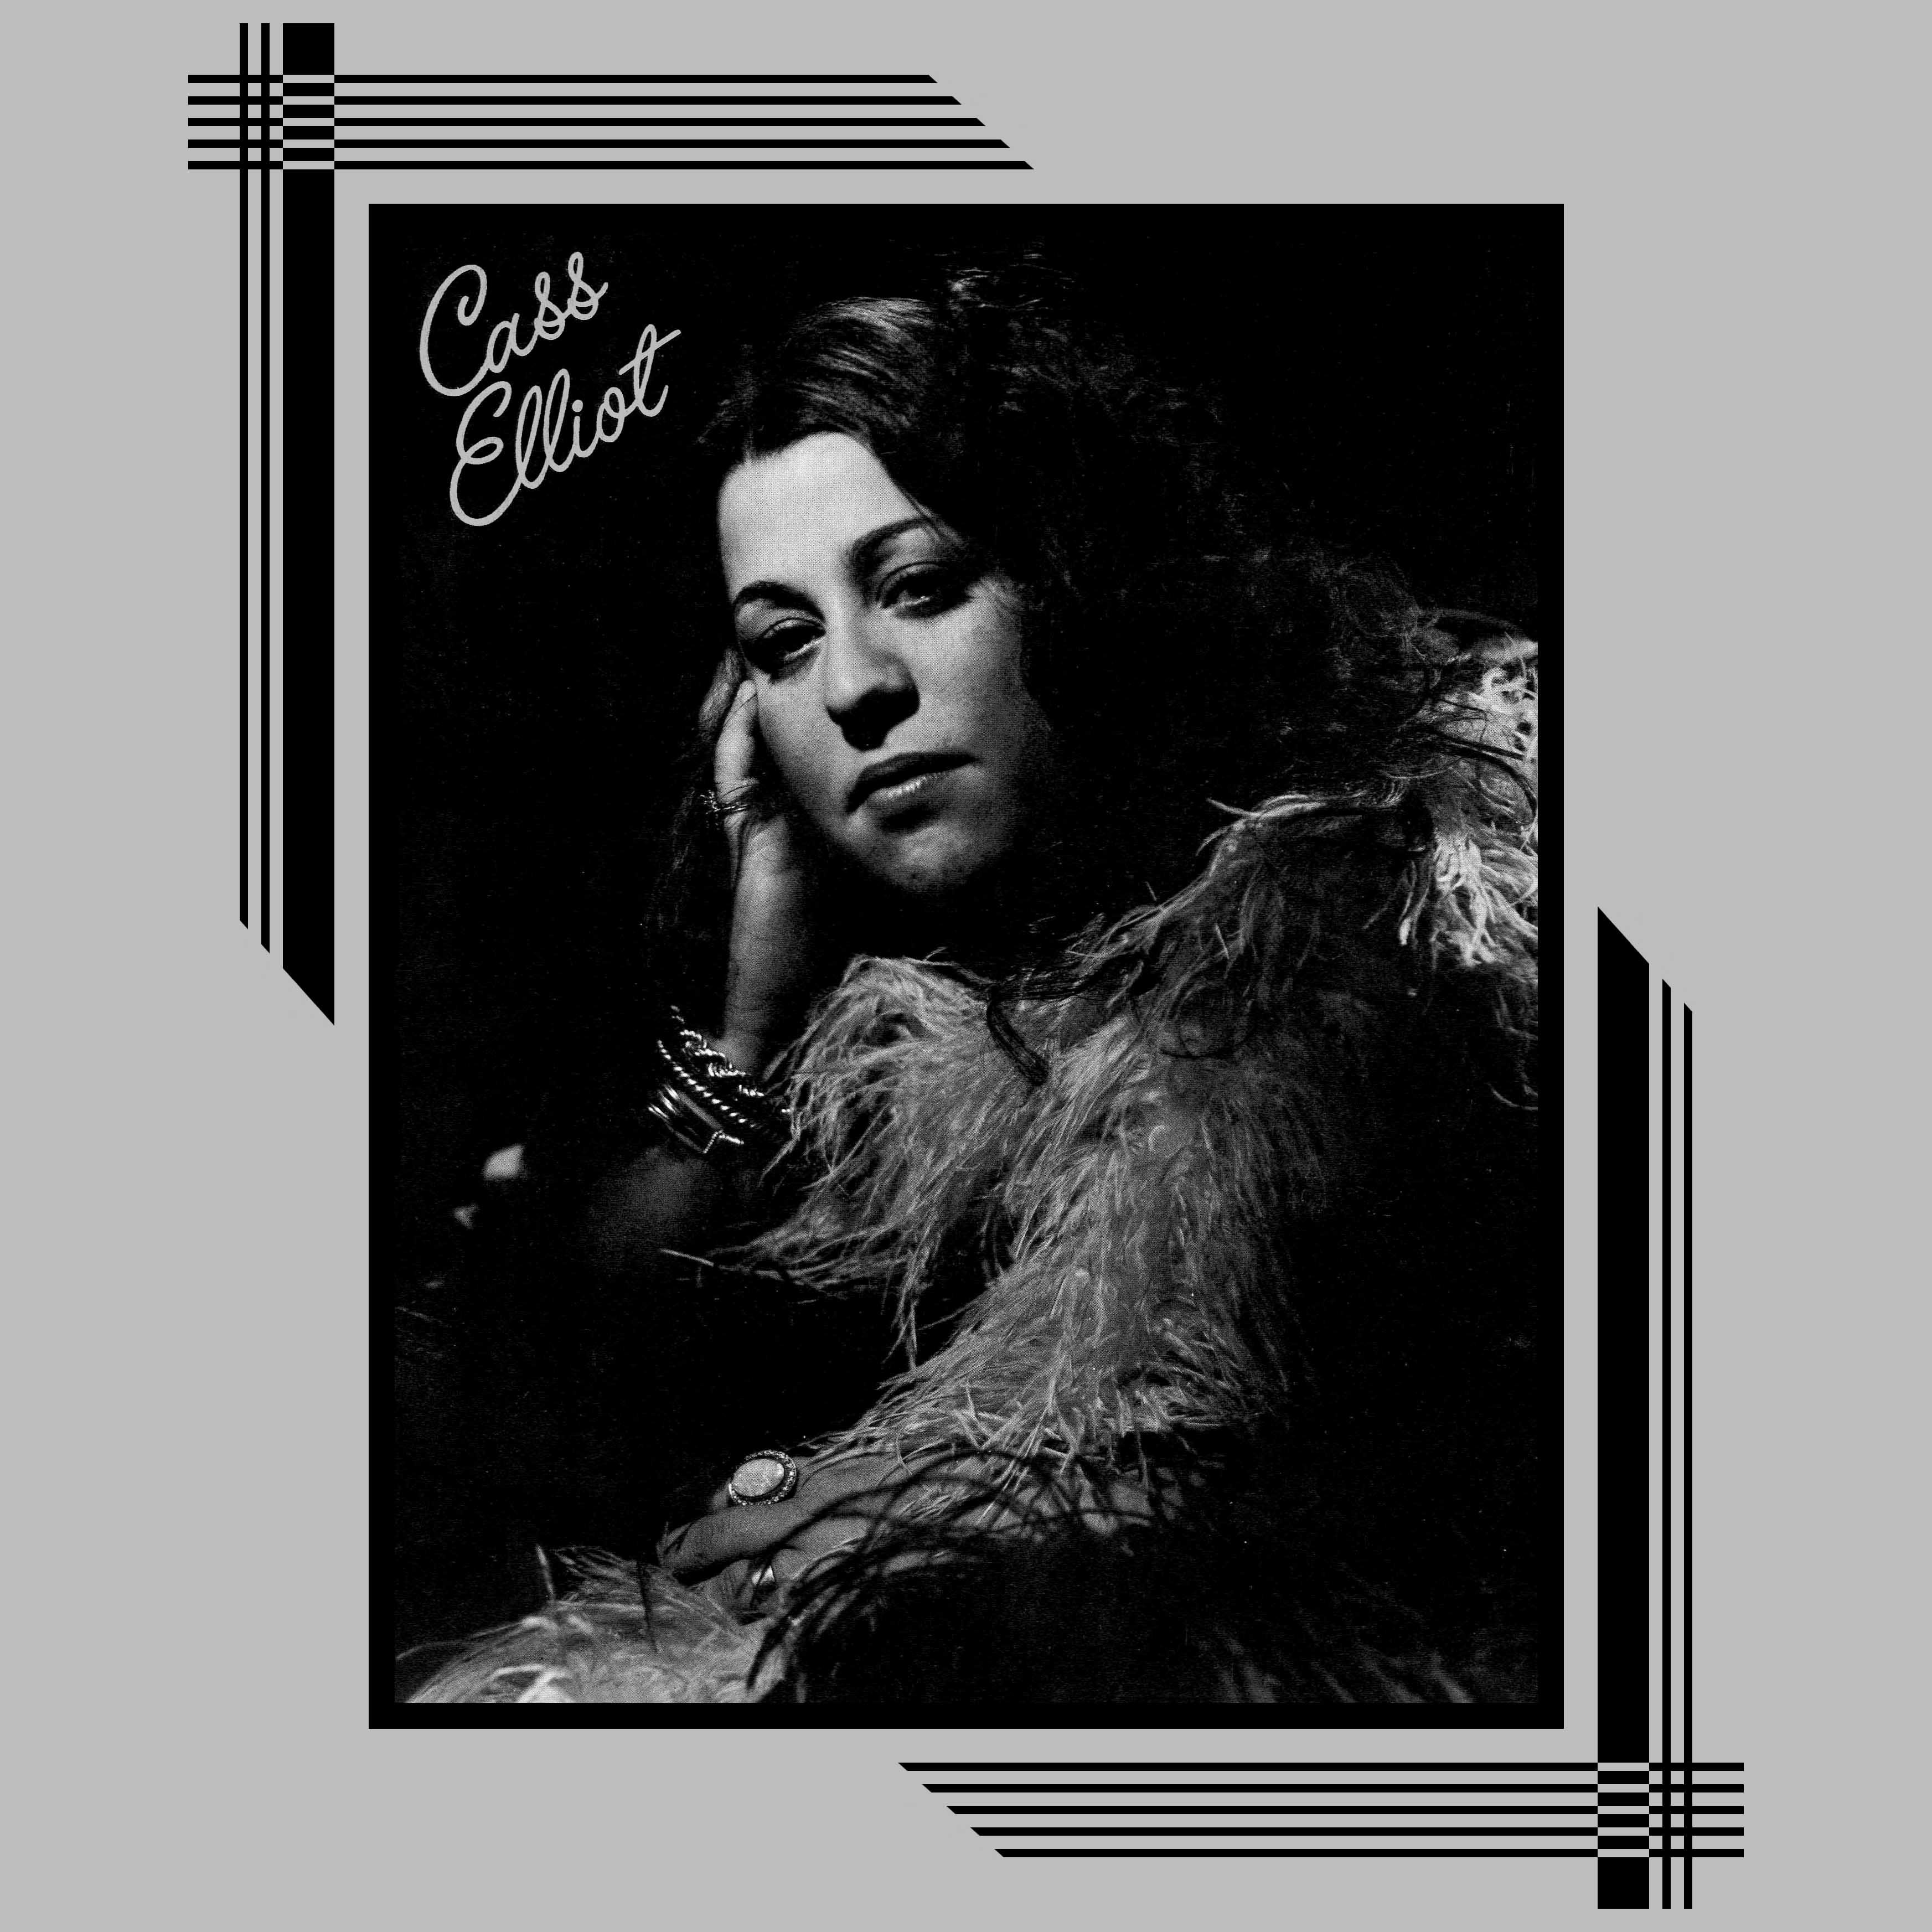 Cass Elliot cover